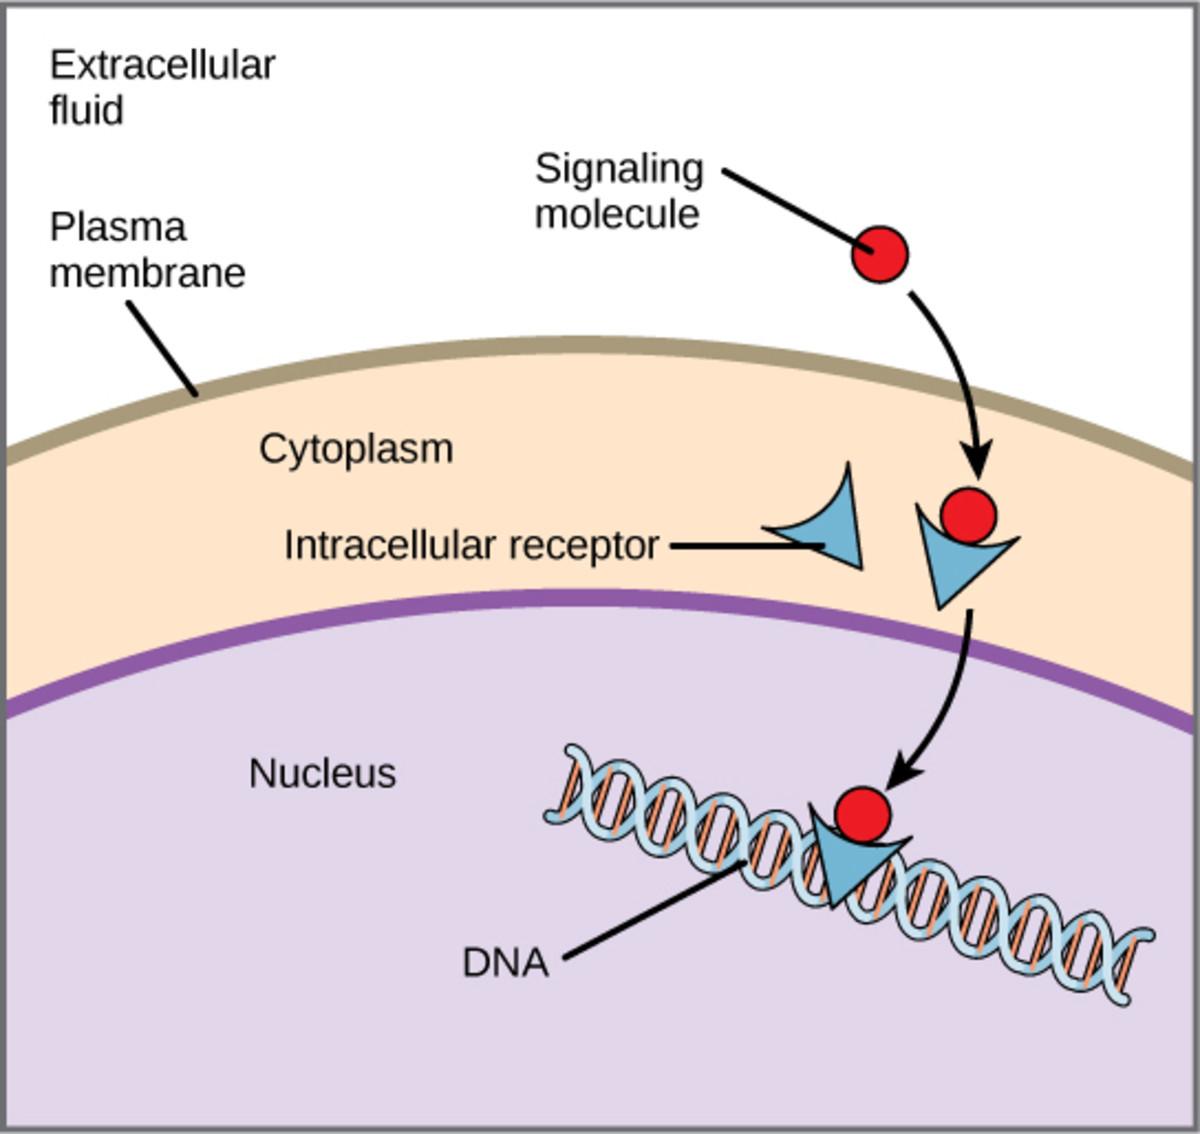 DNA-linked receptors